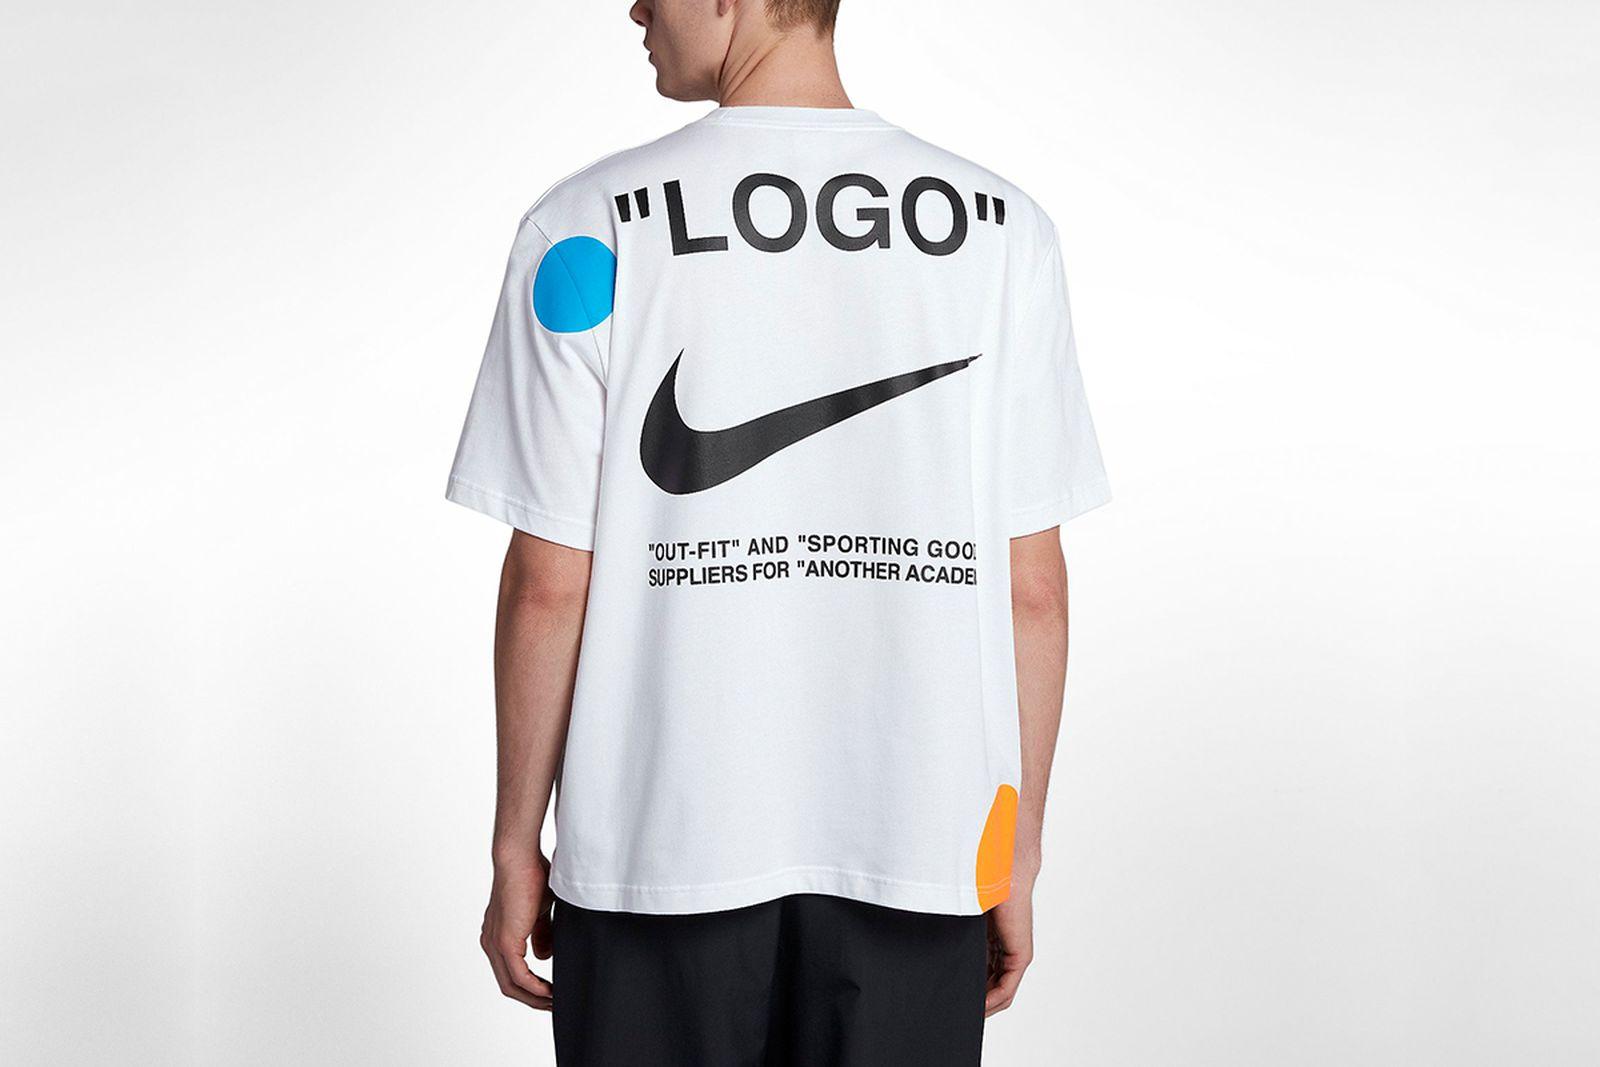 t shirt2 2018 FIFA World Cup Nike OFF-WHITE c/o Virgil Abloh